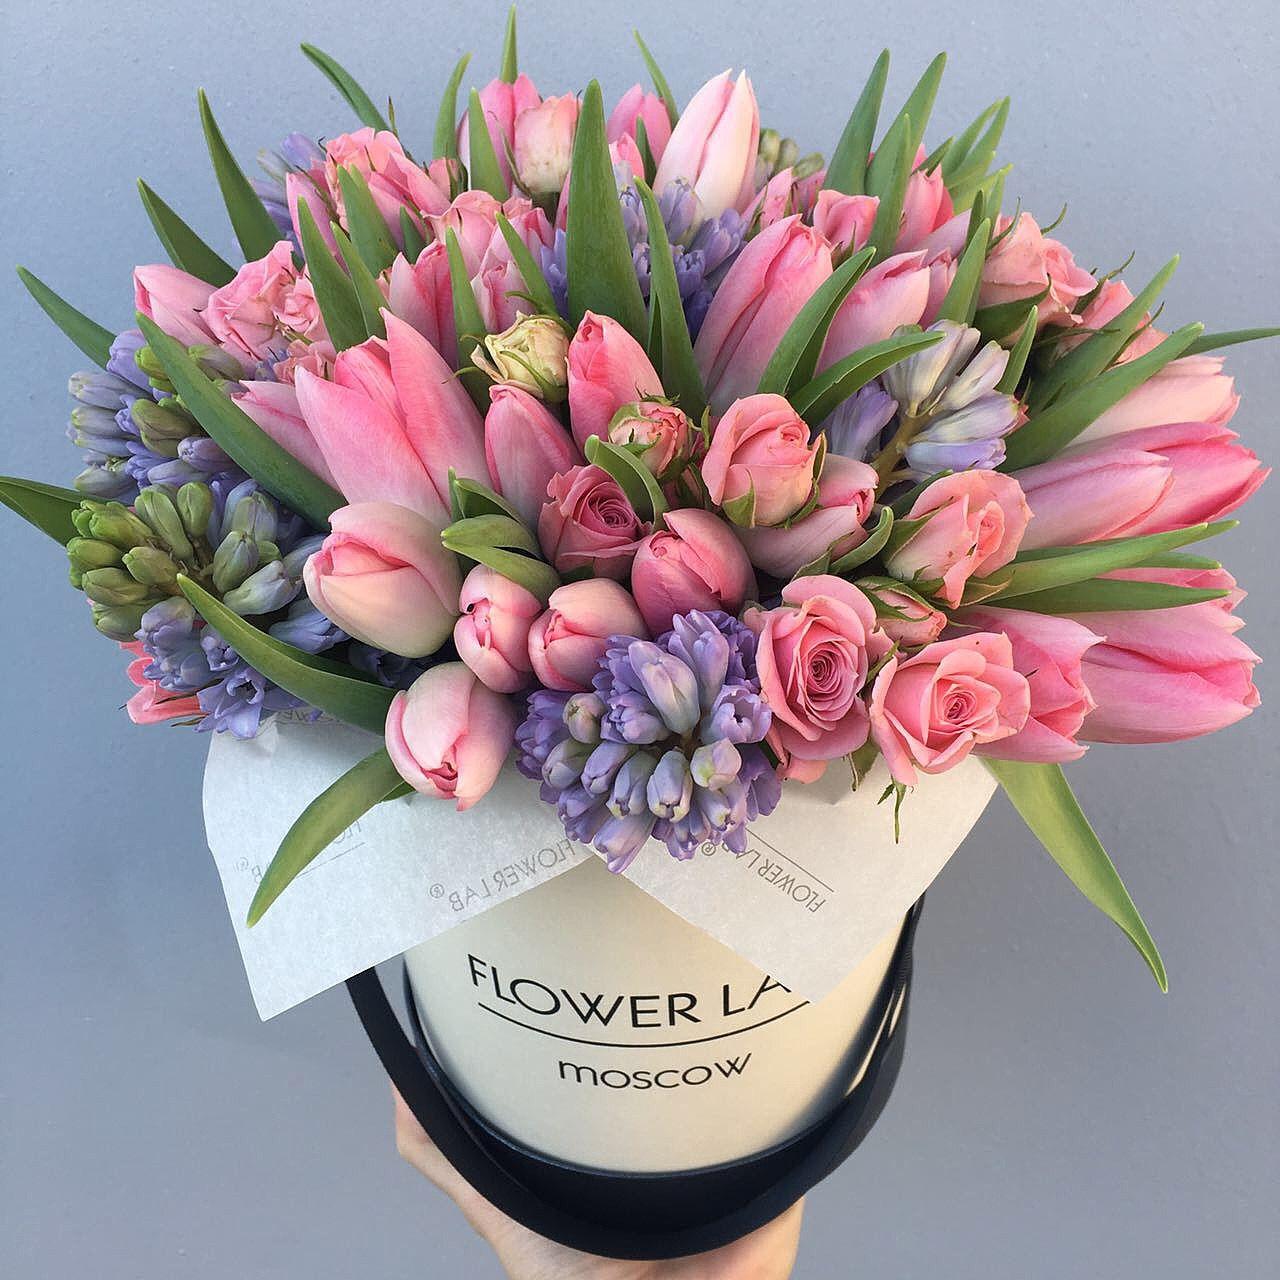 flower lab pinterest flowers flower and izmirmasajfo Gallery